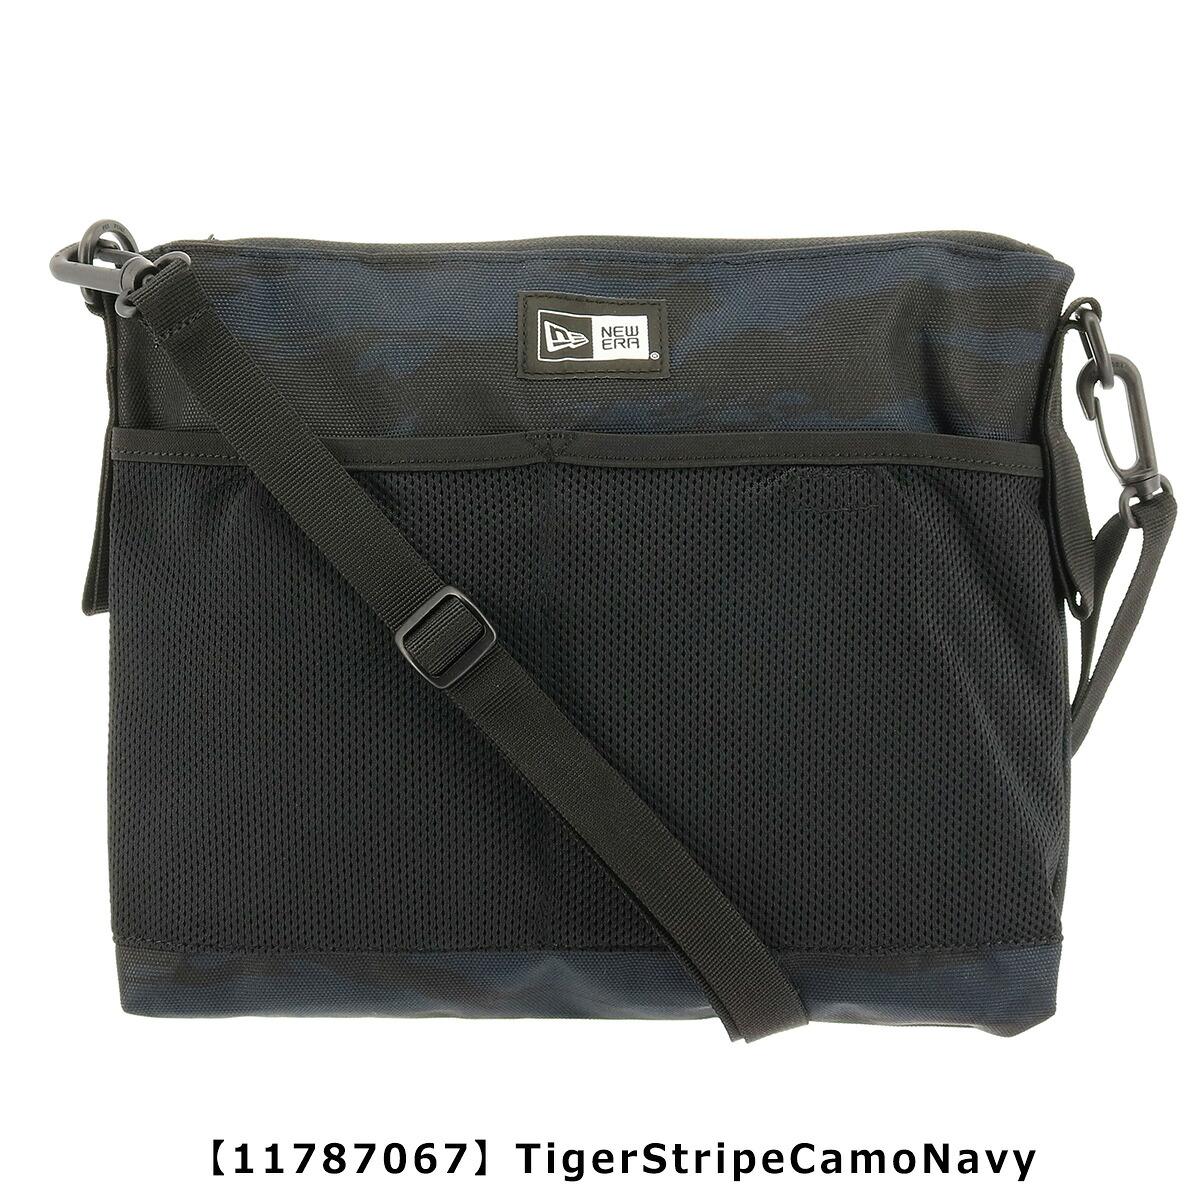 【11787067】TigerStripeCamoNavy